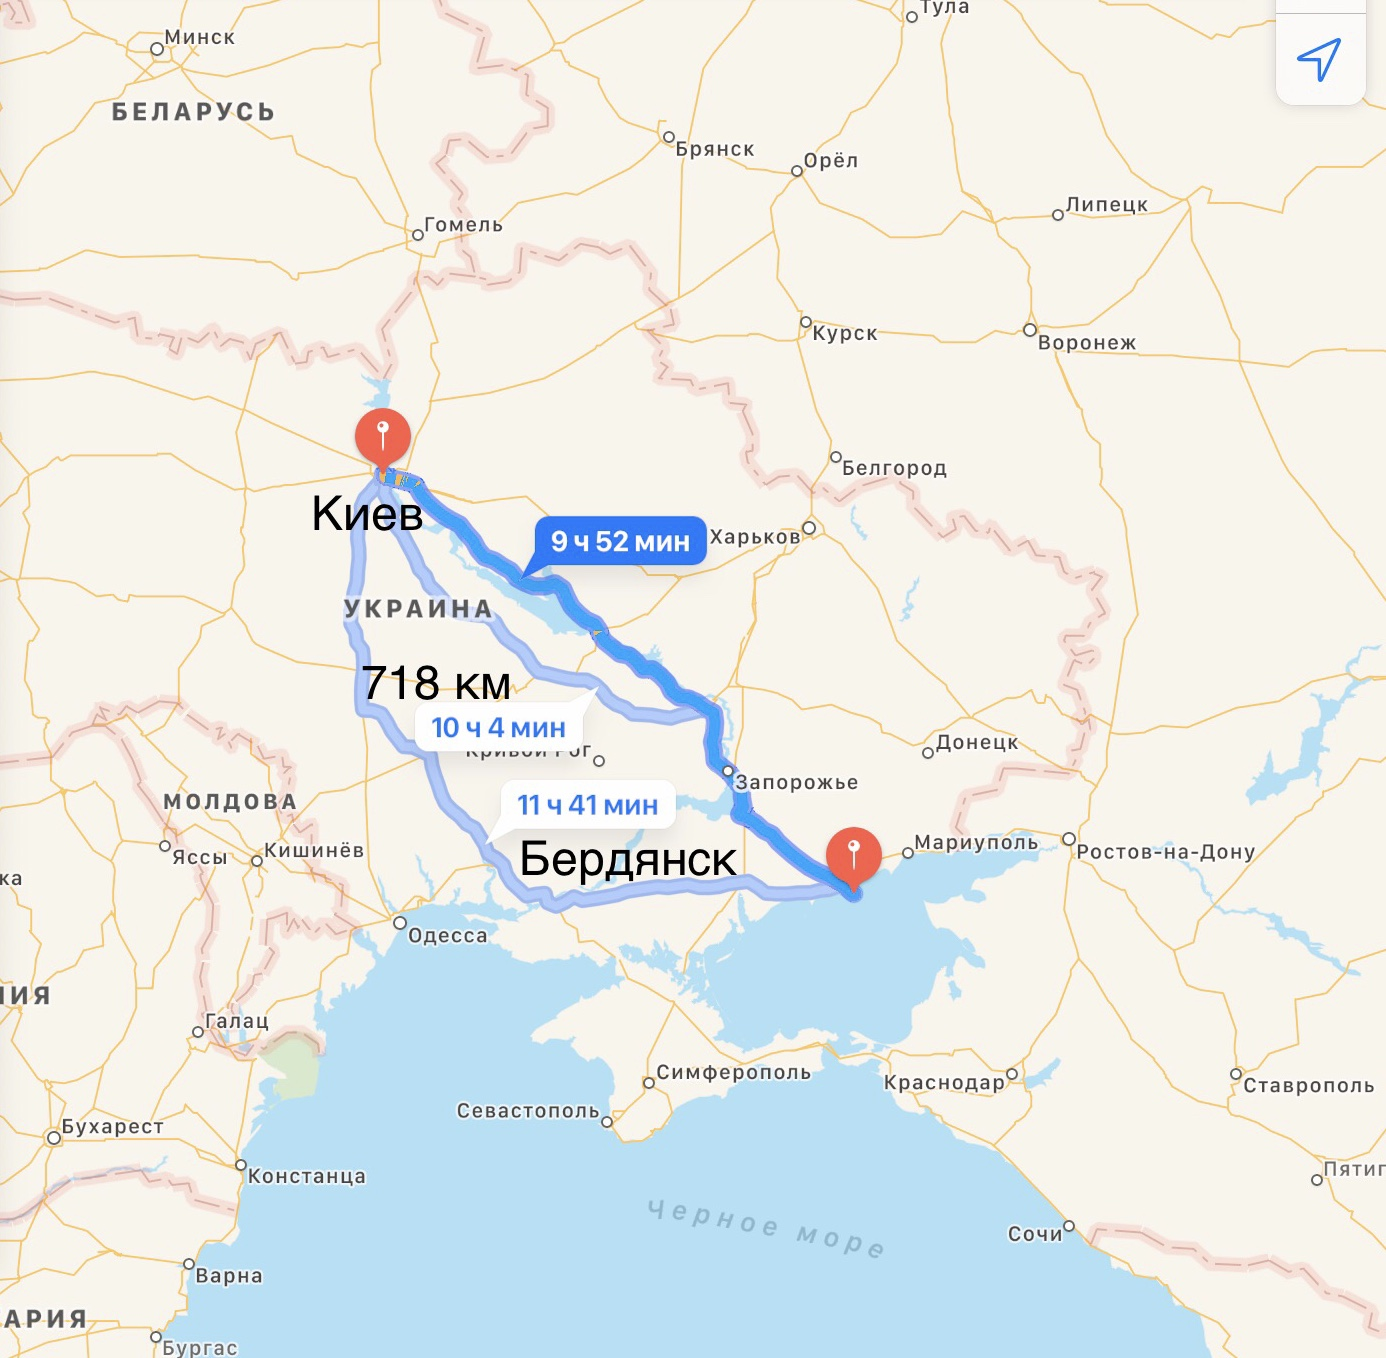 Грузоперевозки Киев – Бердянск